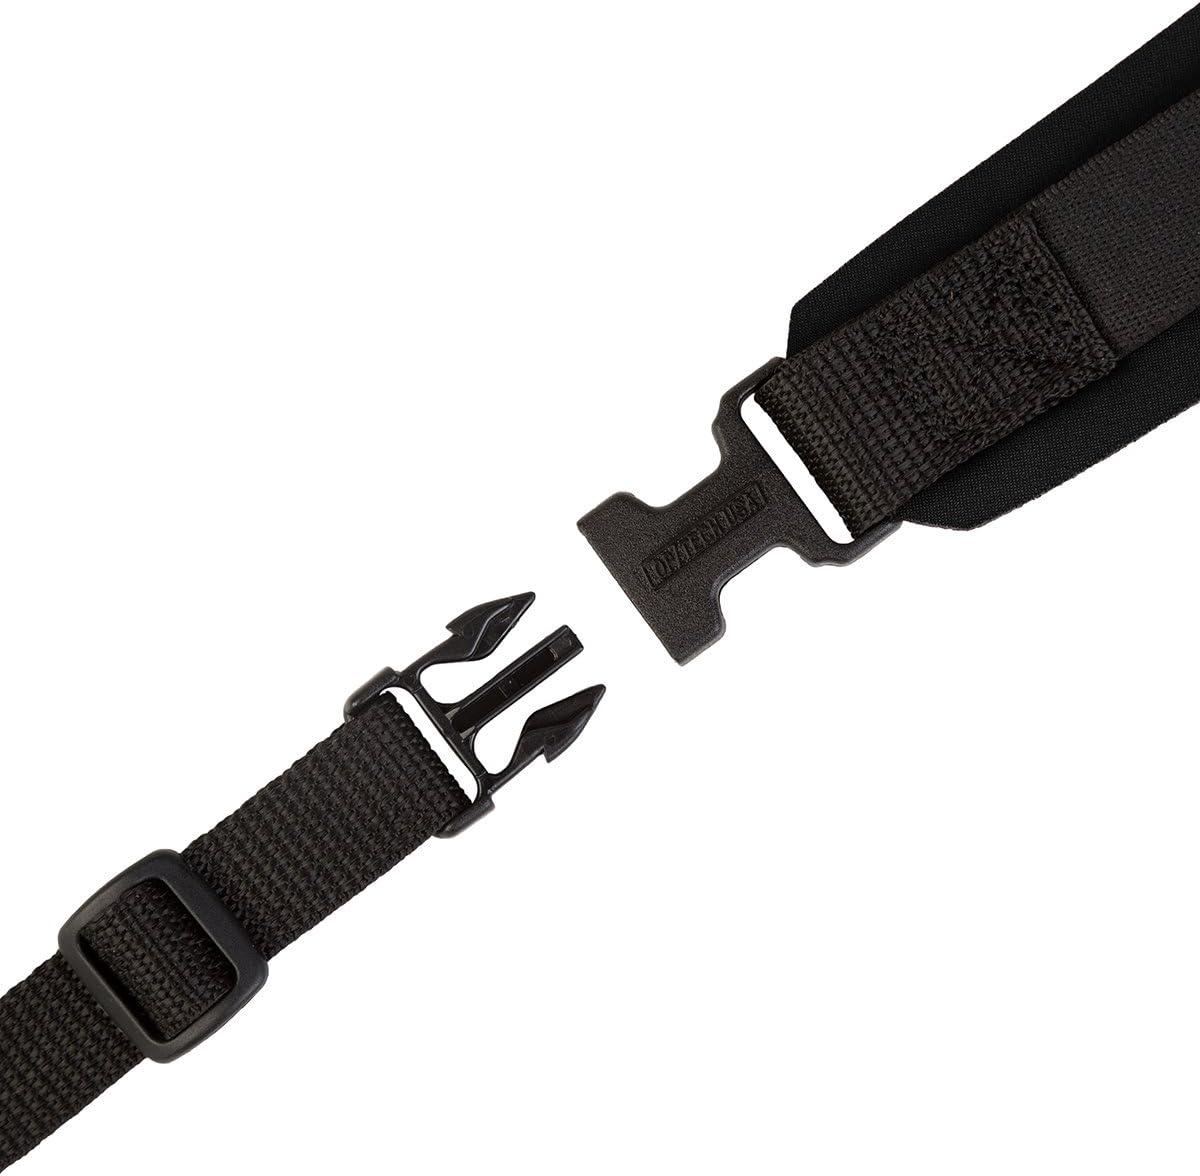 Gurte OP//TECH USA 1501372 Gurt Digitalkamera Neoprene Schwarz Digitalkamera, Neoprene, Schwarz, 6,8 kg, 111,8 cm